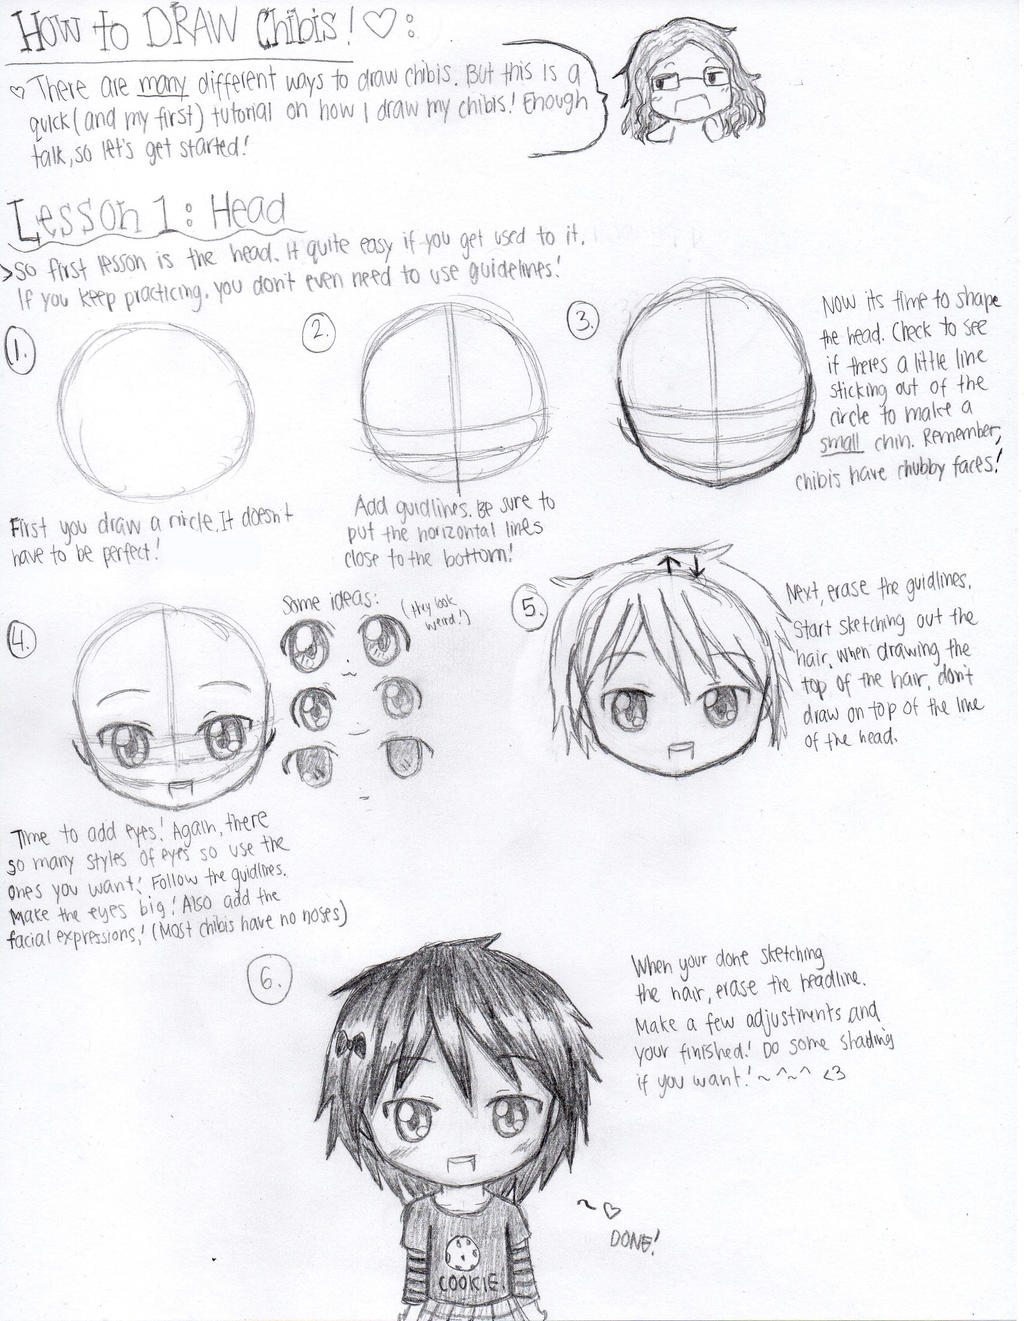 Chibi Head Drawing Tutorial By Emodetectiveespada Chibi Head Drawing  Tutorial By Emodetectiveespada